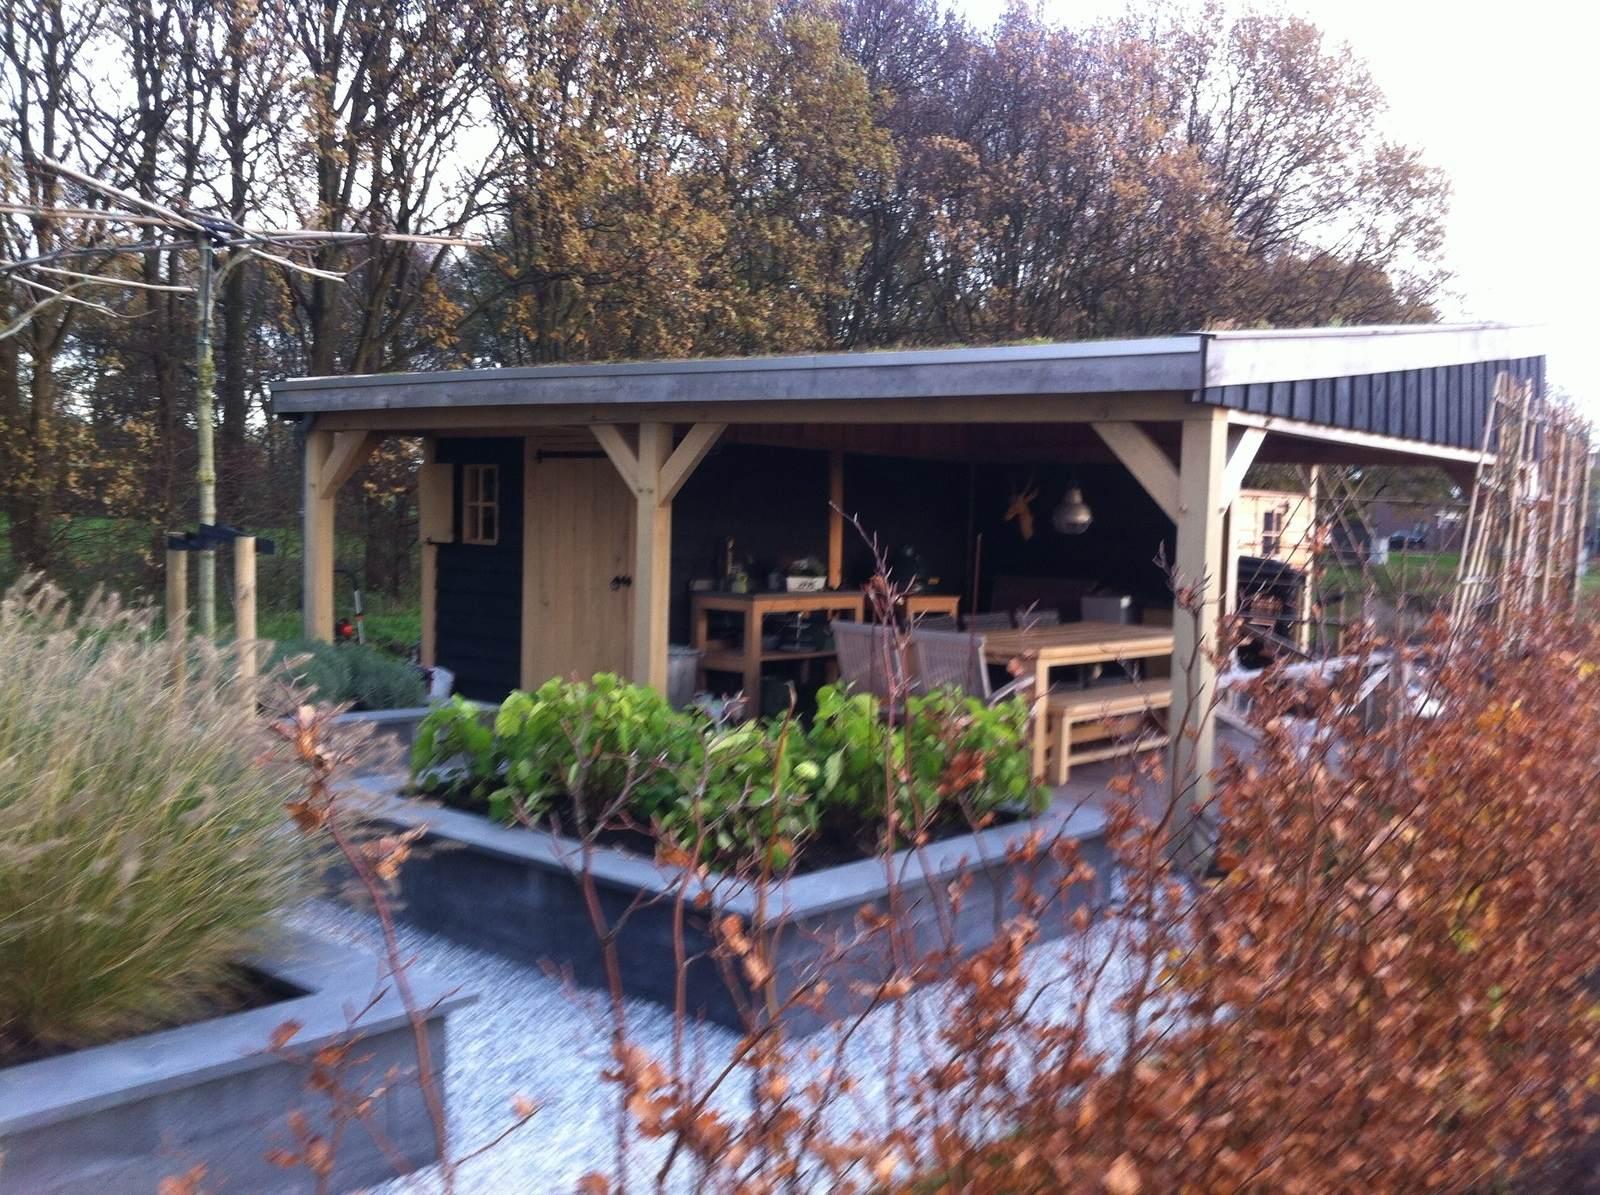 Eiken-tuinhuis-met-overkapping-groendak - Tuinhuis met Groendak